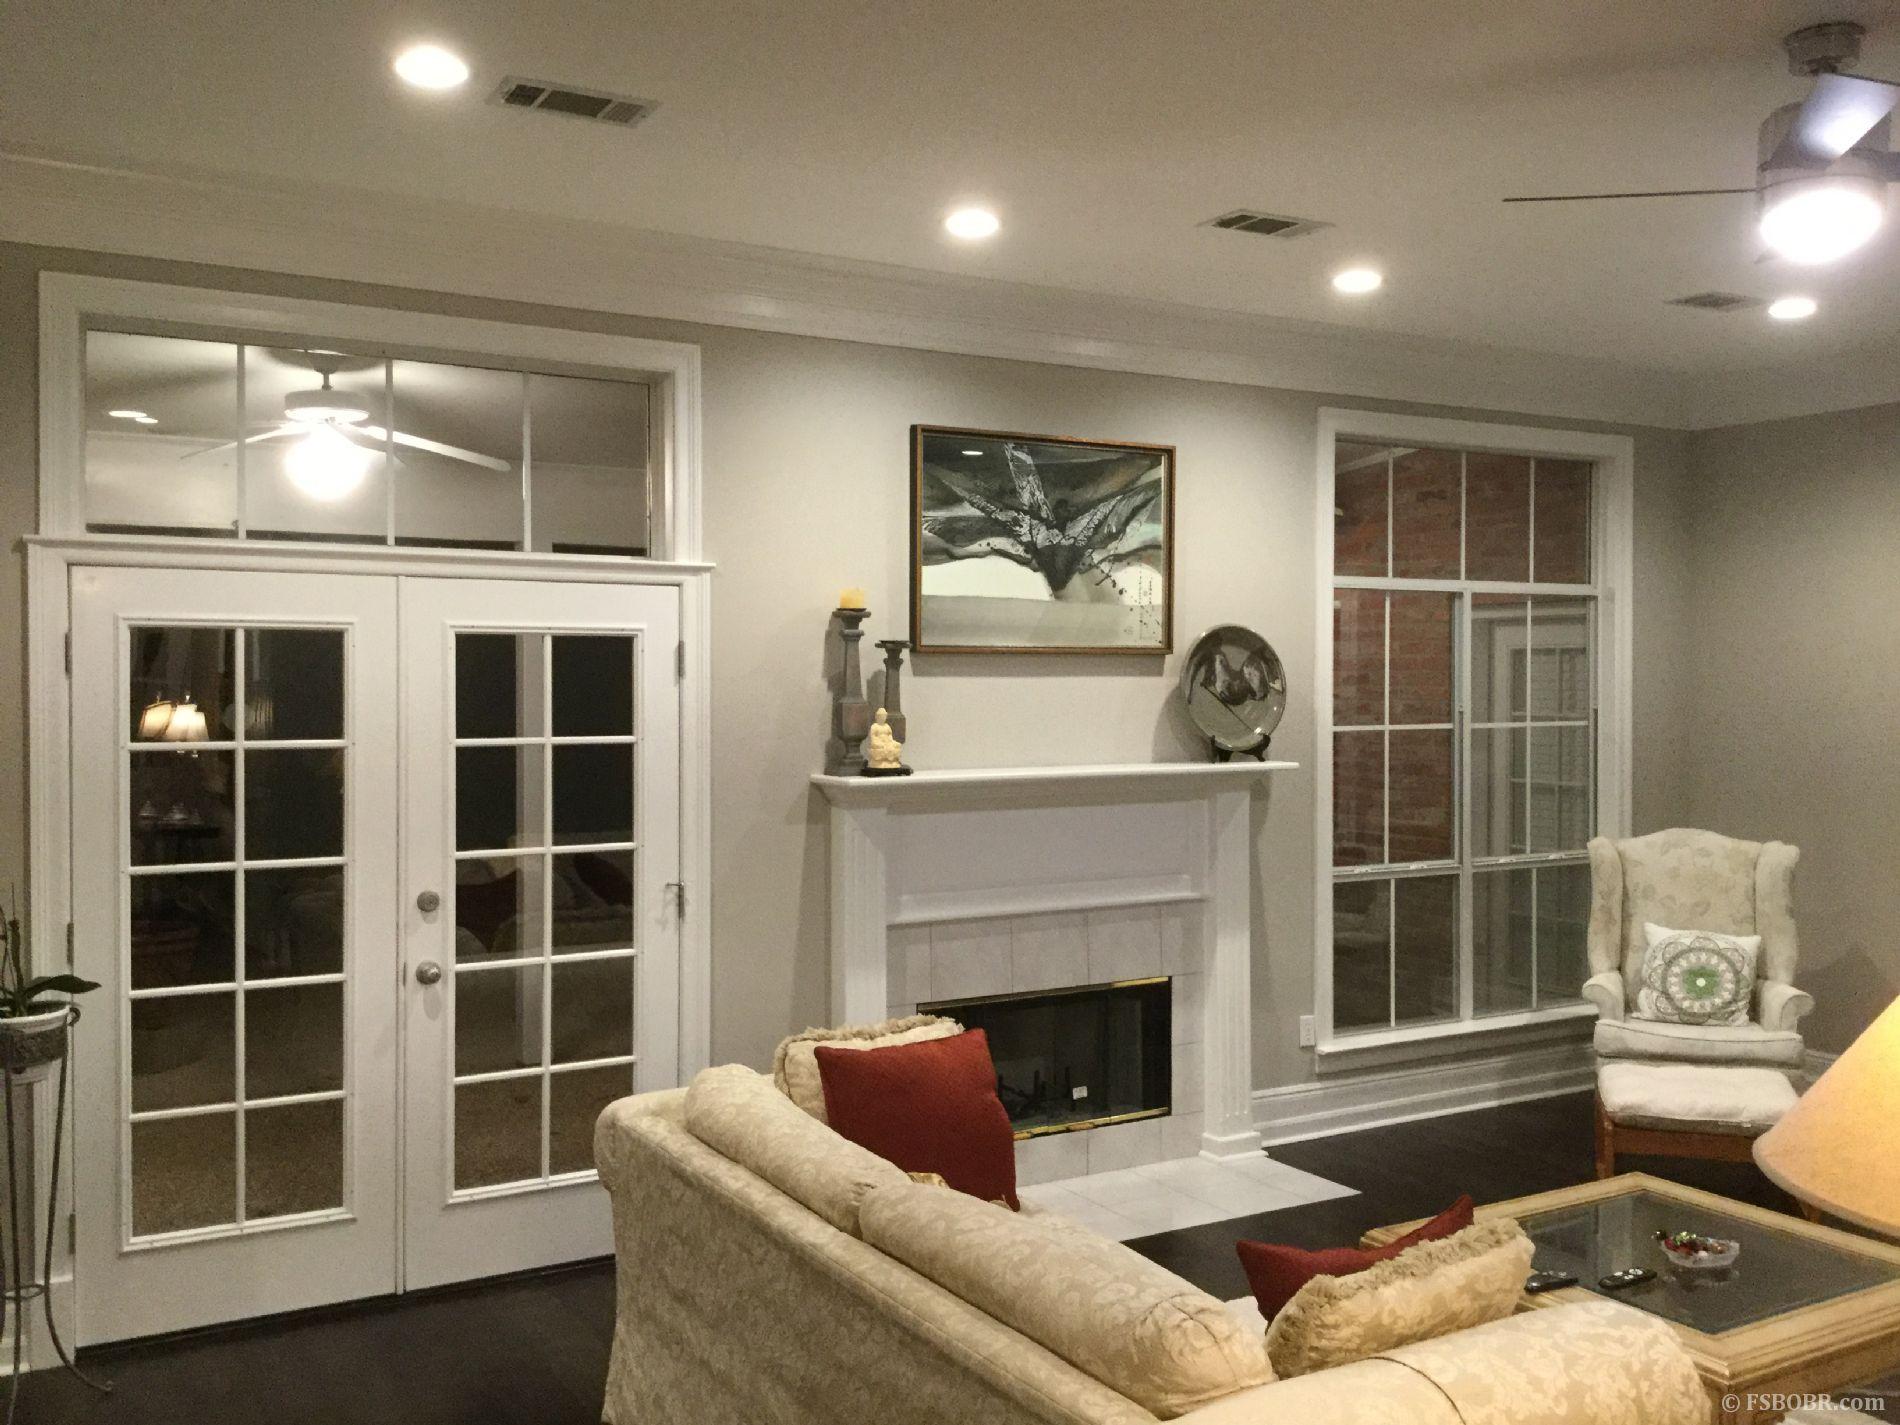 Renovated Custom Home Woodchase 1614 Pointer Court Baton Rouge LA